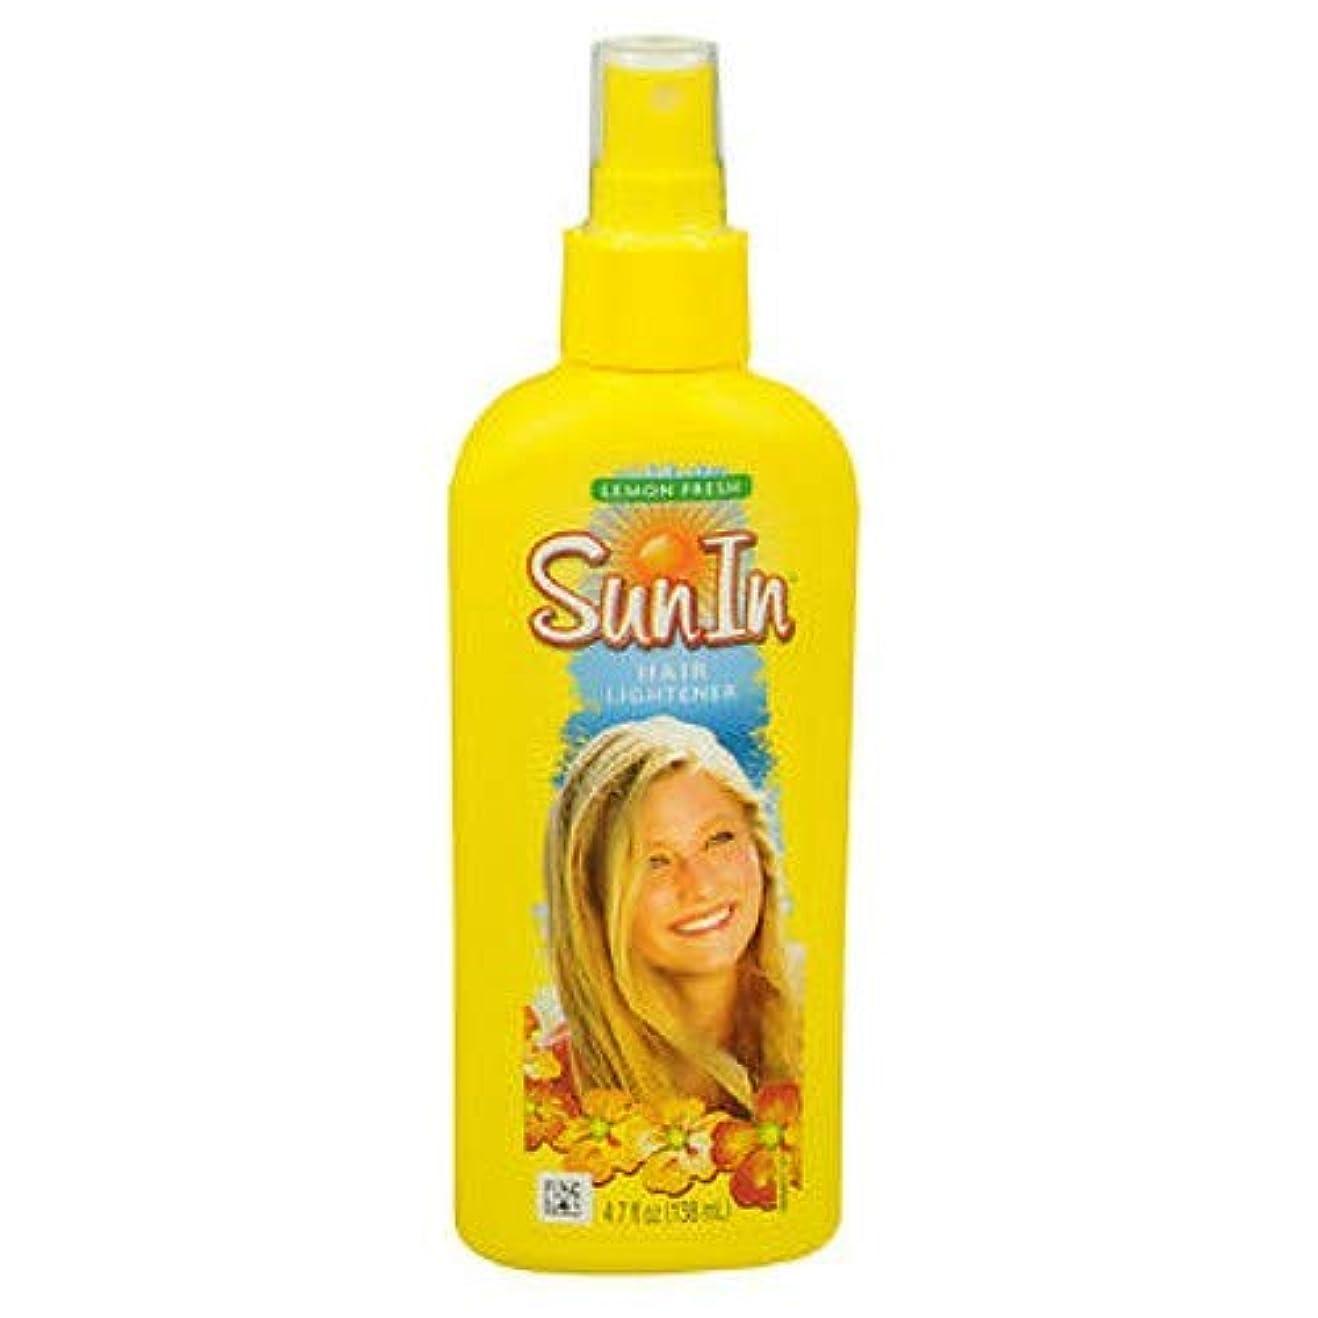 純度財布研究海外直送品Sun-In Sun-In Hair Lightener Spray Lemon Fresh, Lemon Fresh 4.7 oz